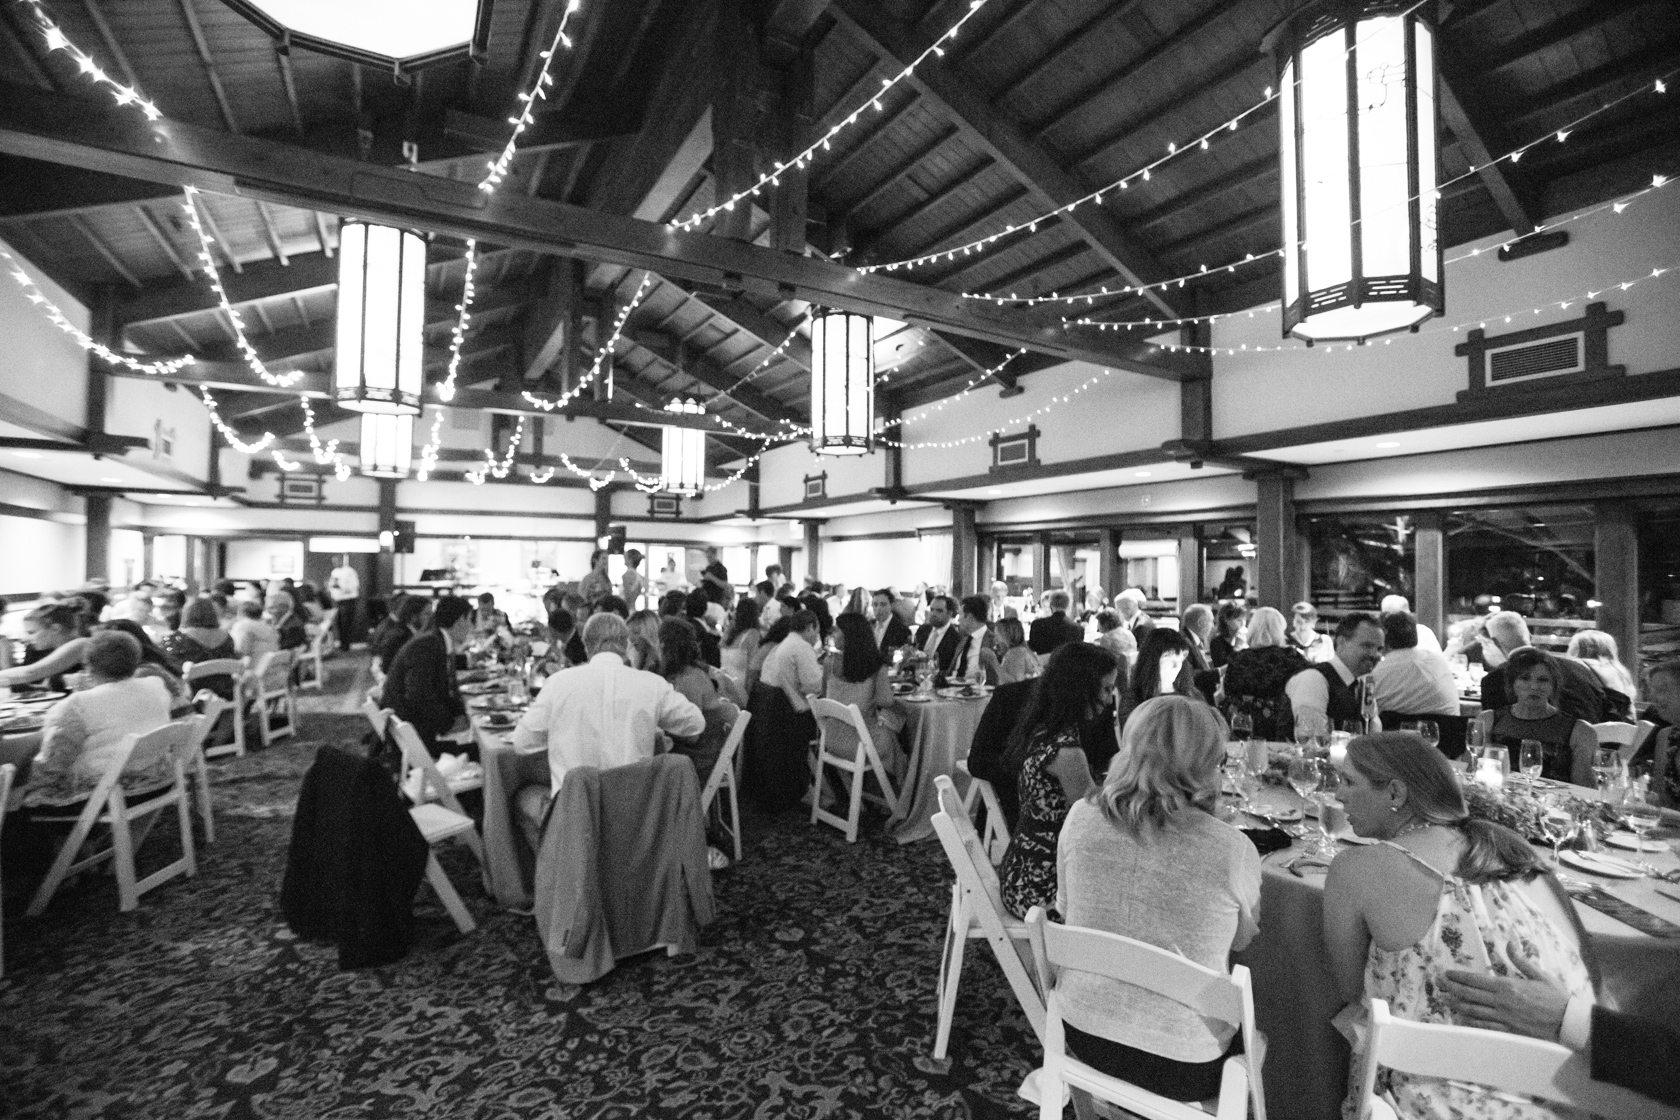 The_Lodge_at_Torrey_Pines_Wedding_112.jpg